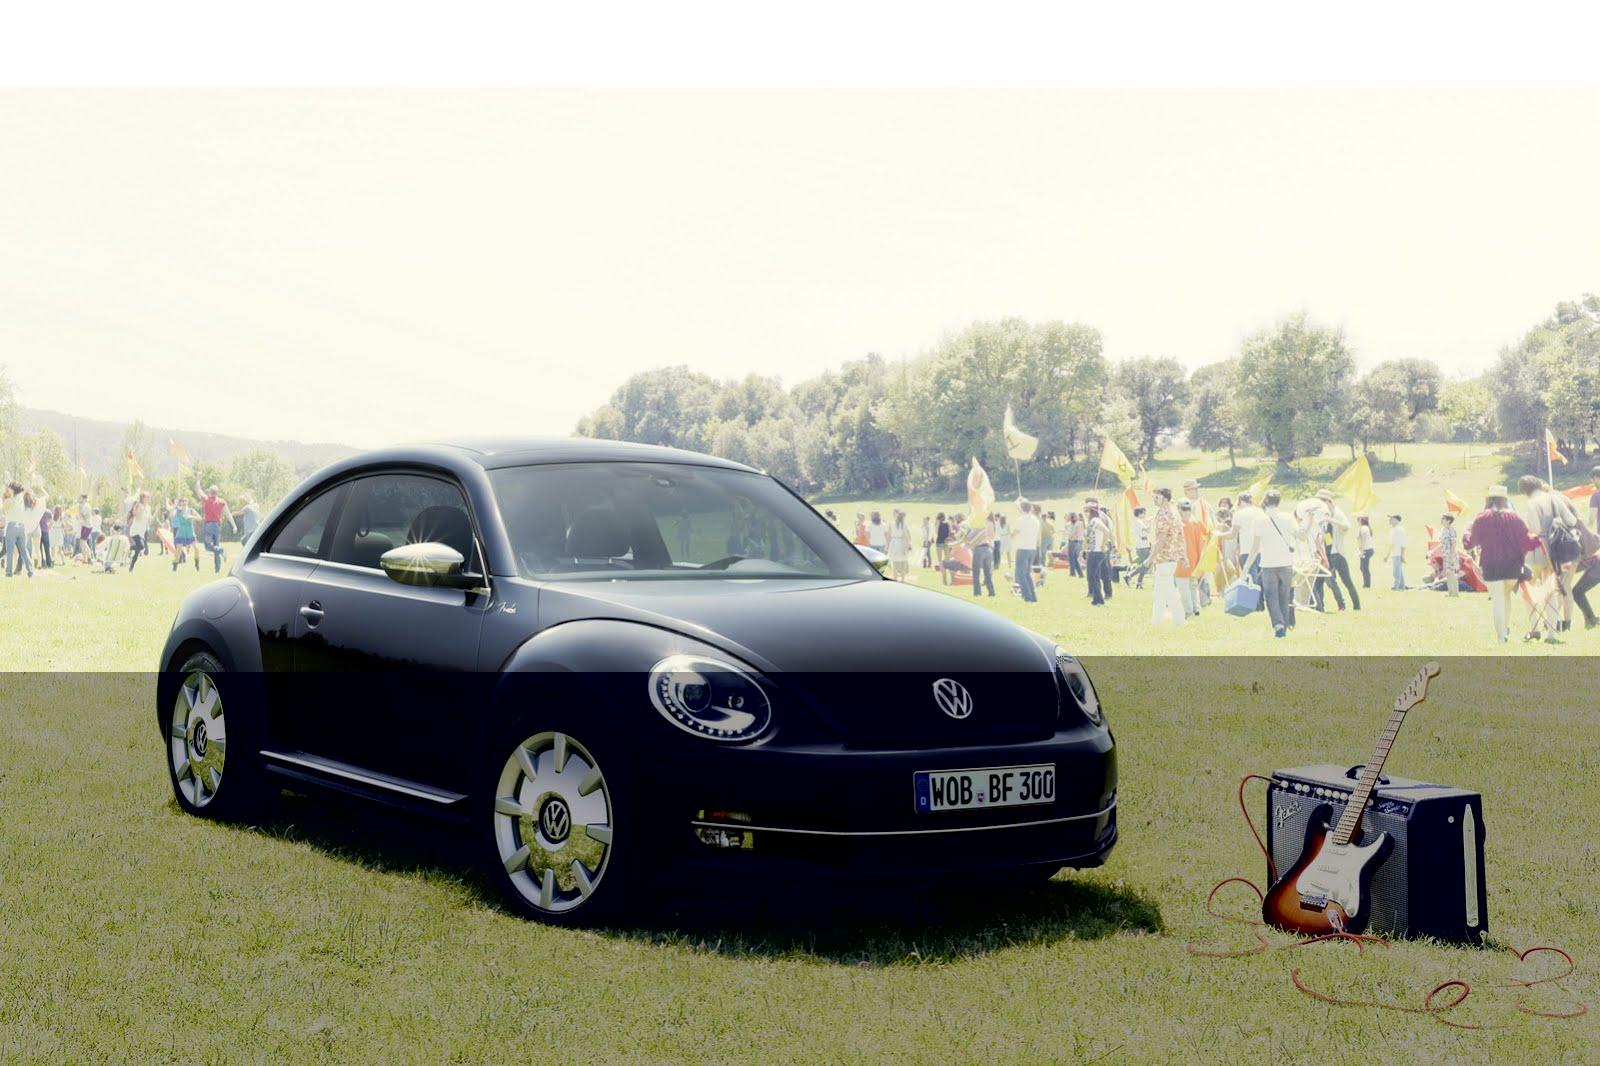 http://1.bp.blogspot.com/-PGHa0OXaYXY/T8iSjq_gA6I/AAAAAAAAgm0/Mum2jF4qzhE/s1600/2013-VW-Beetle-Fender-Edition-0004.jpg